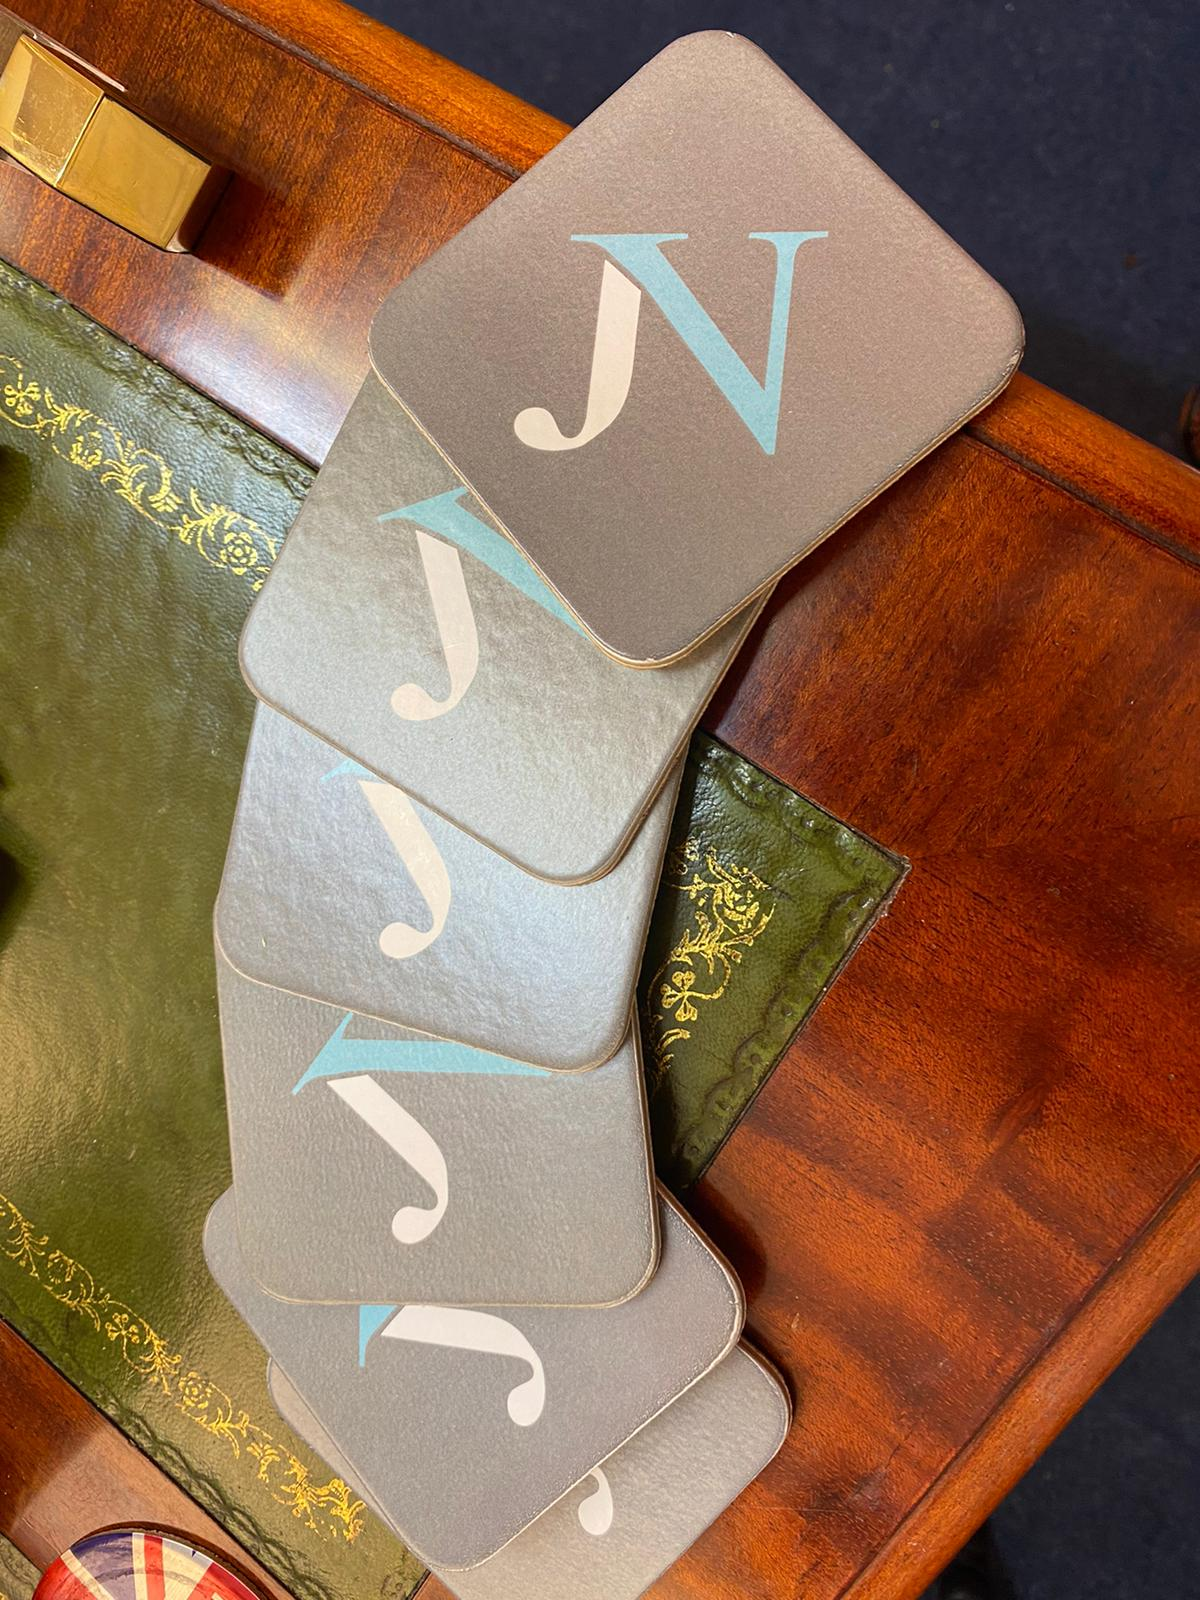 JN Coasters